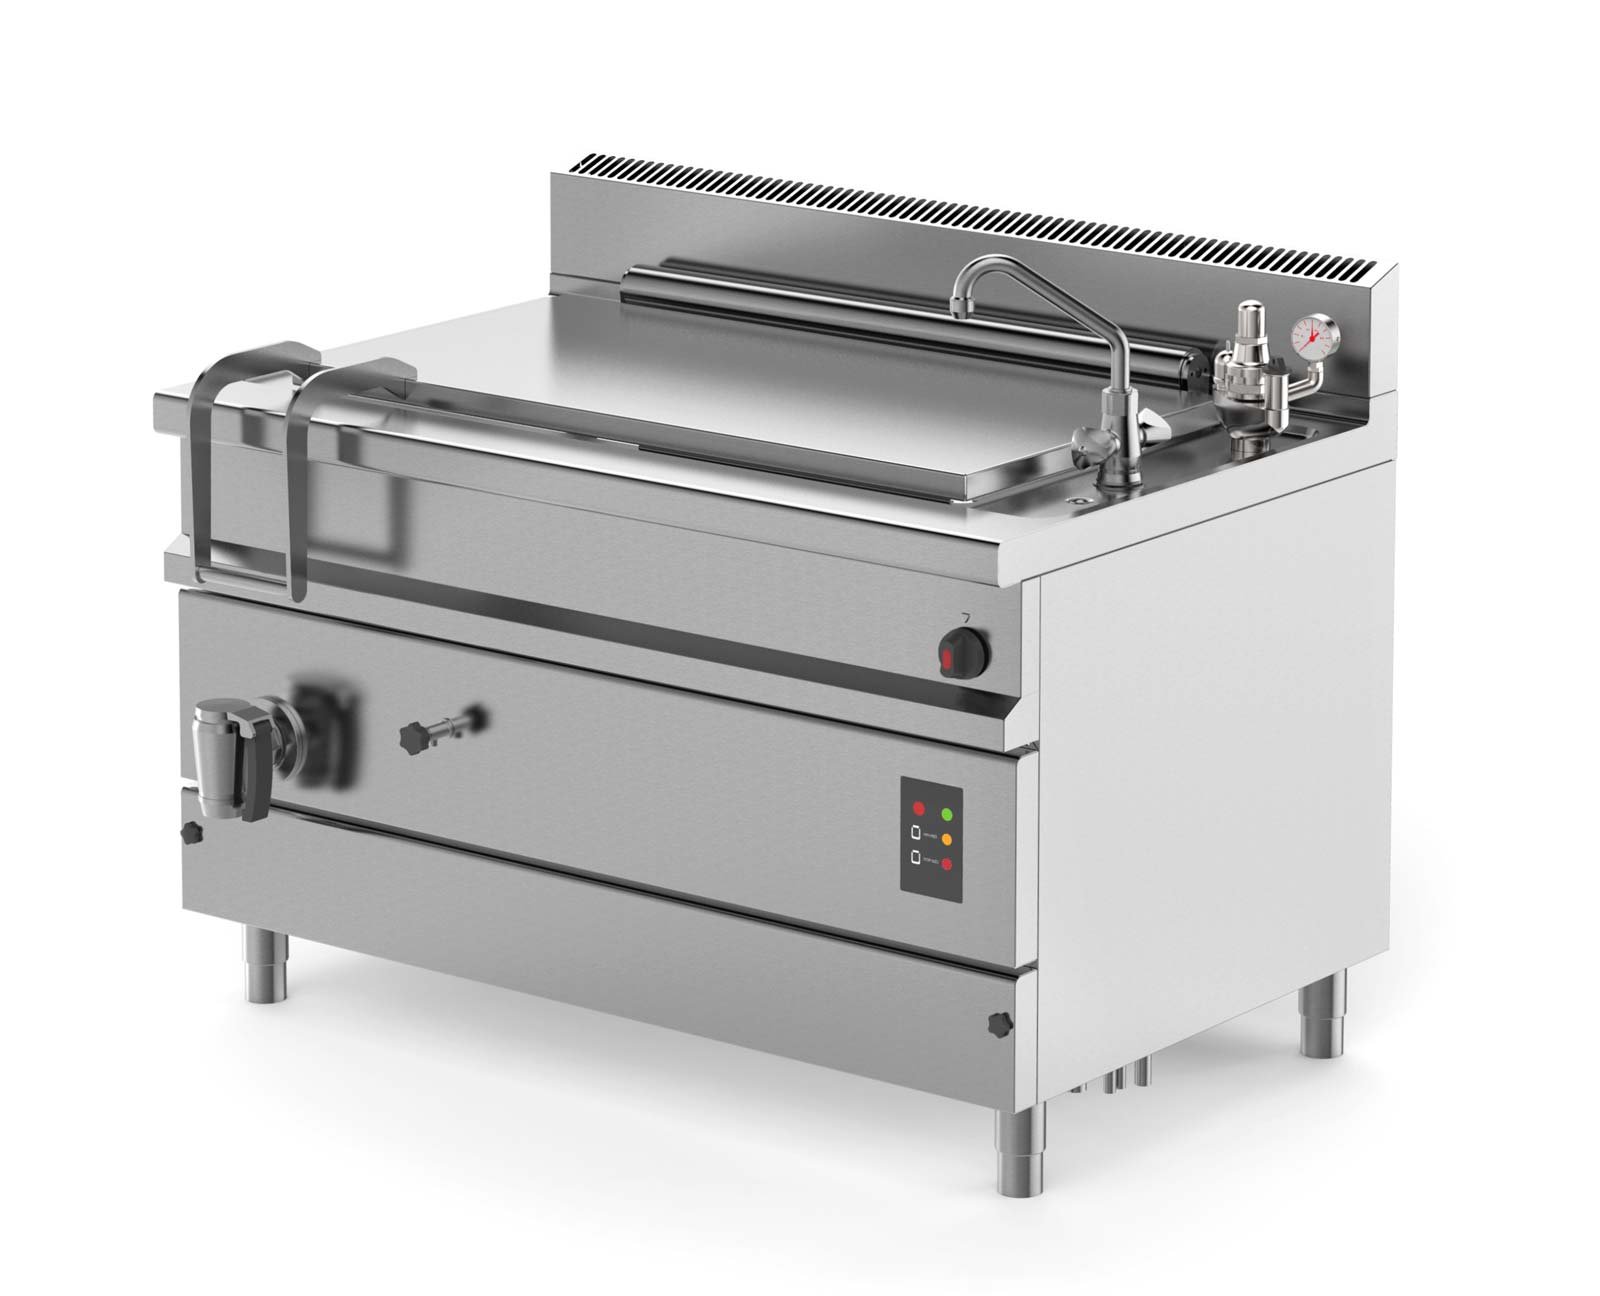 Firex Easypan Extragrosse Gastronorm-Kochkessel mit 200, 300, 400 Liter